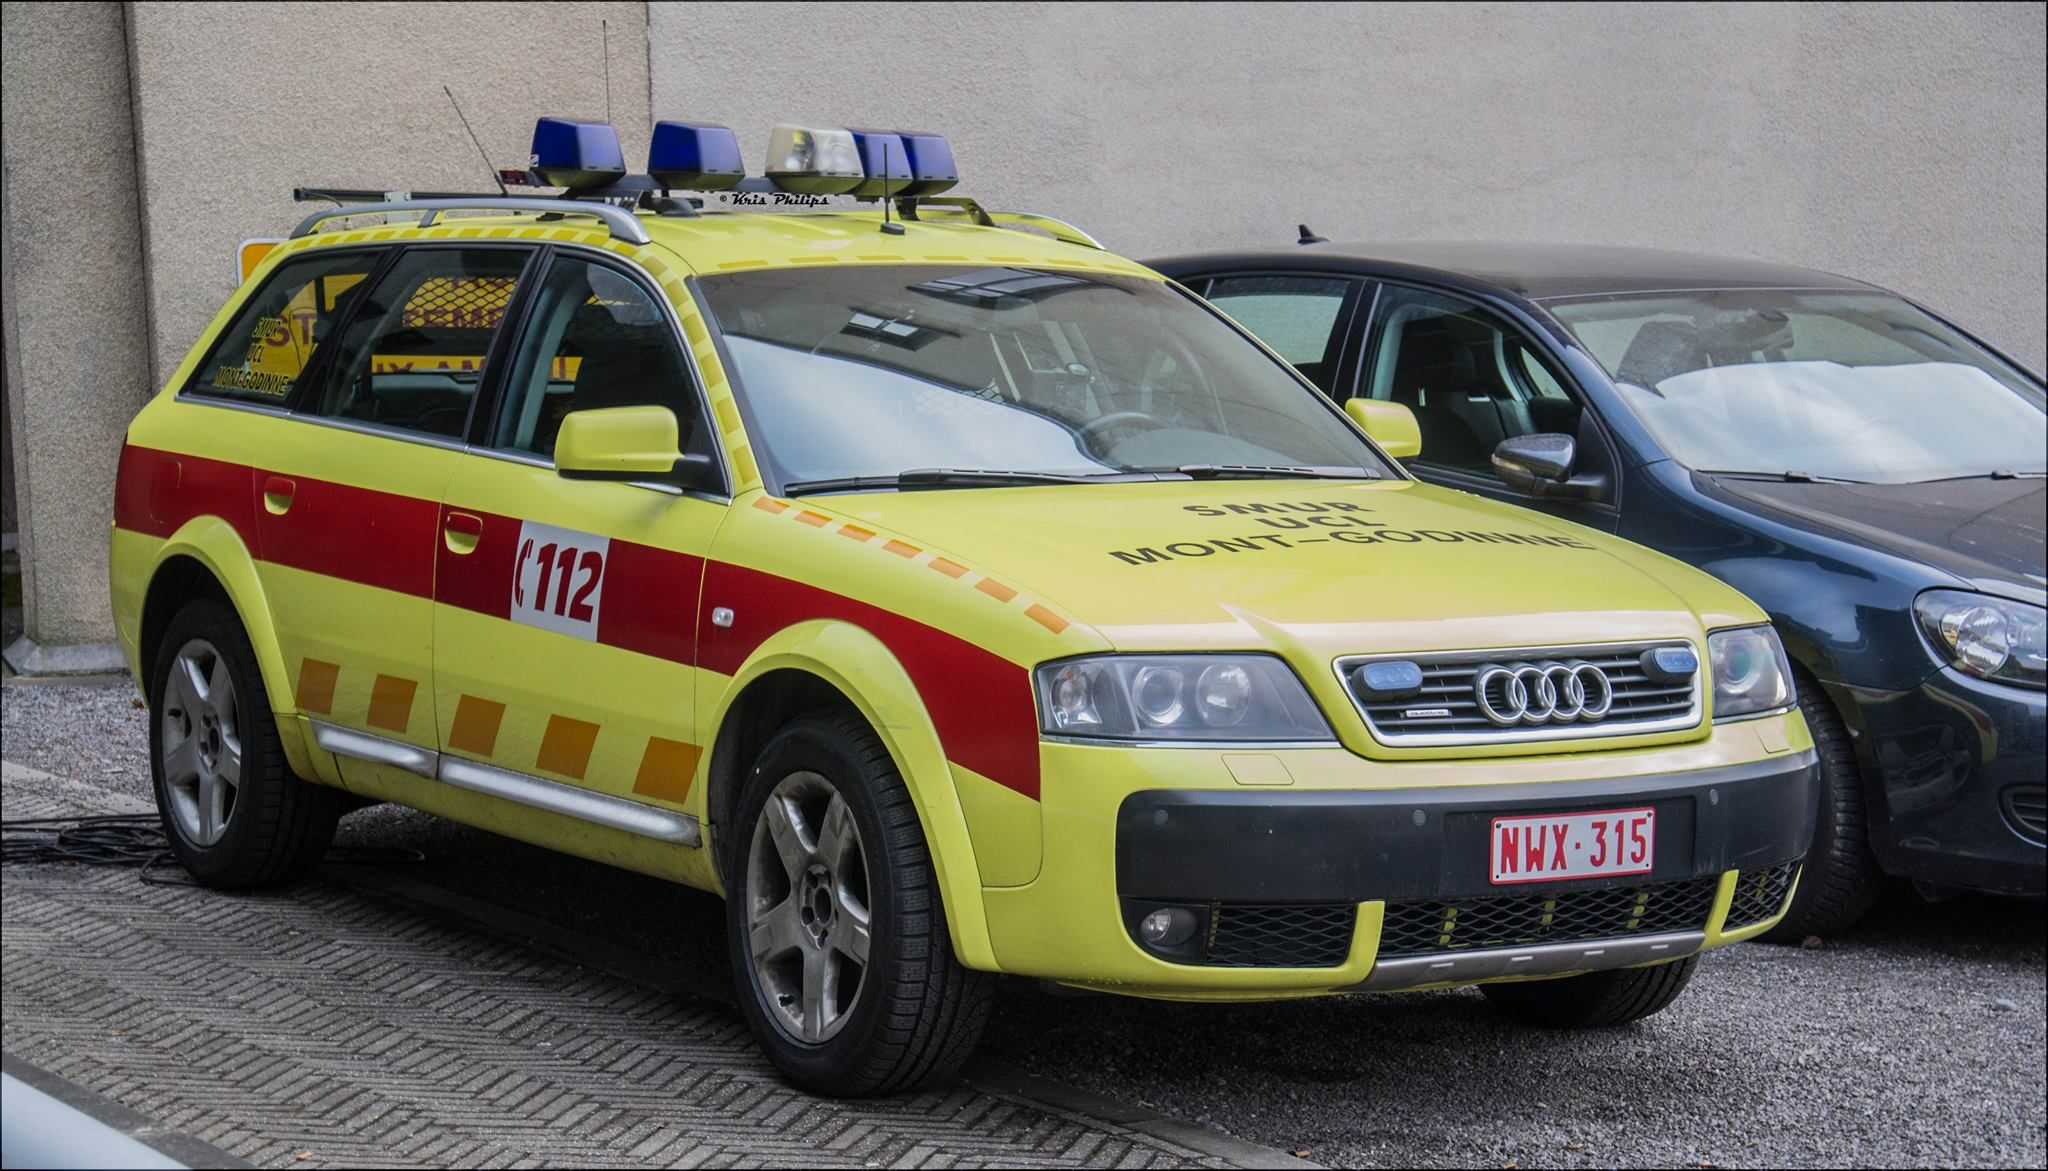 15 étonné Audi All Road